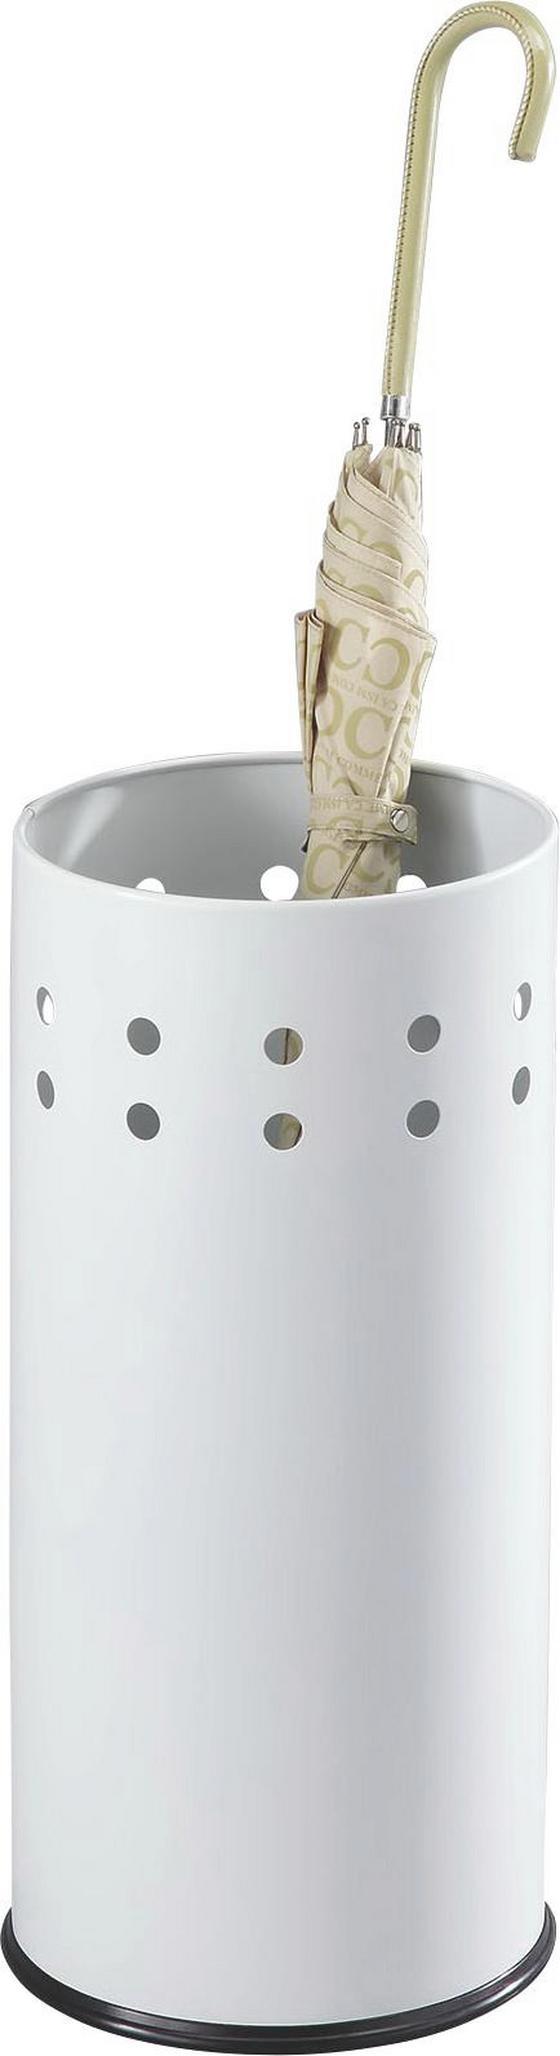 Esernyőtartó Lonati - Fehér, modern, Faalapú anyag/Fém (23,5/50cm)